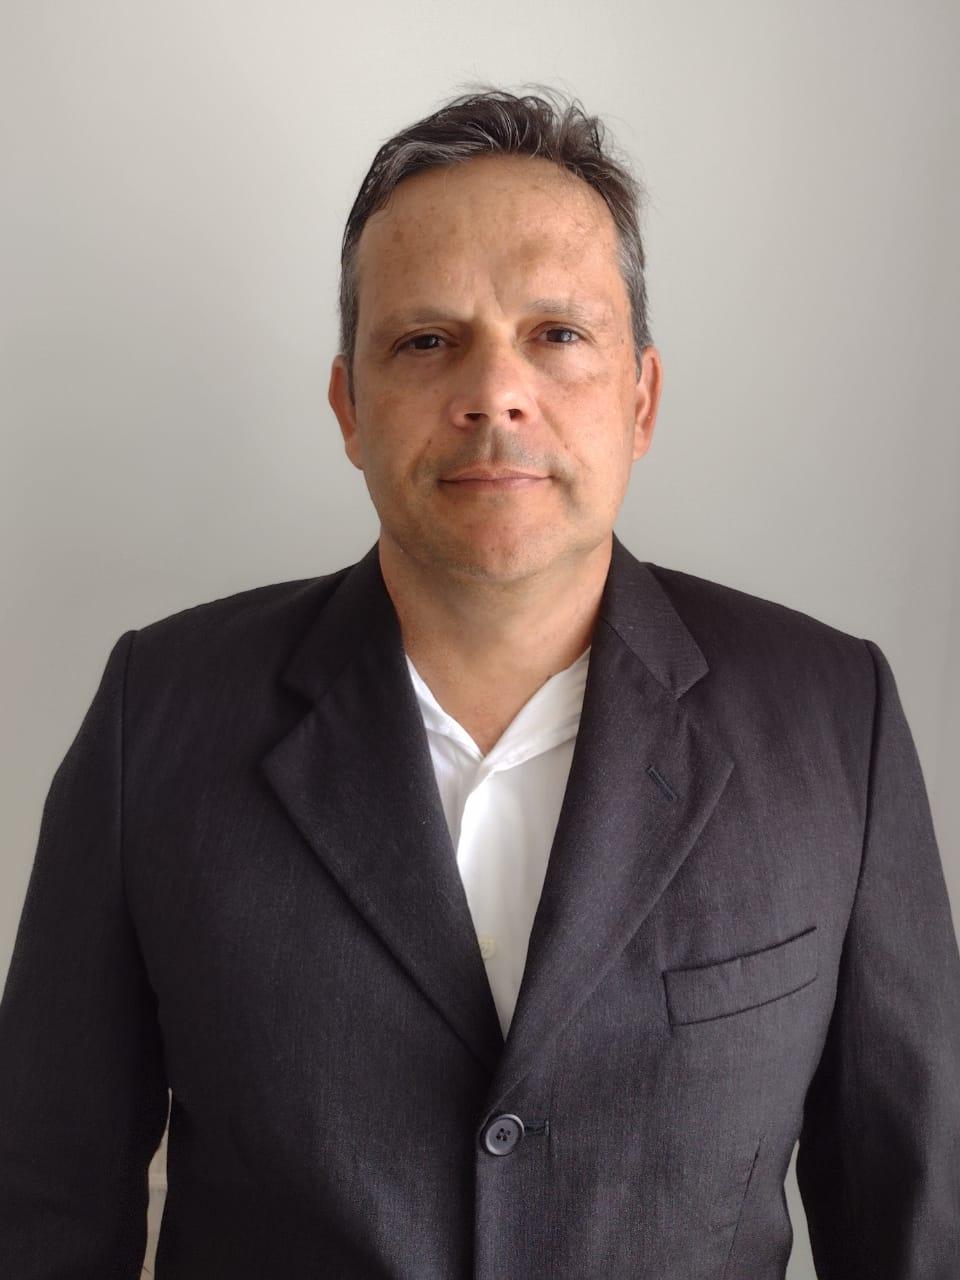 Fábio Ricardo Sobral Kano